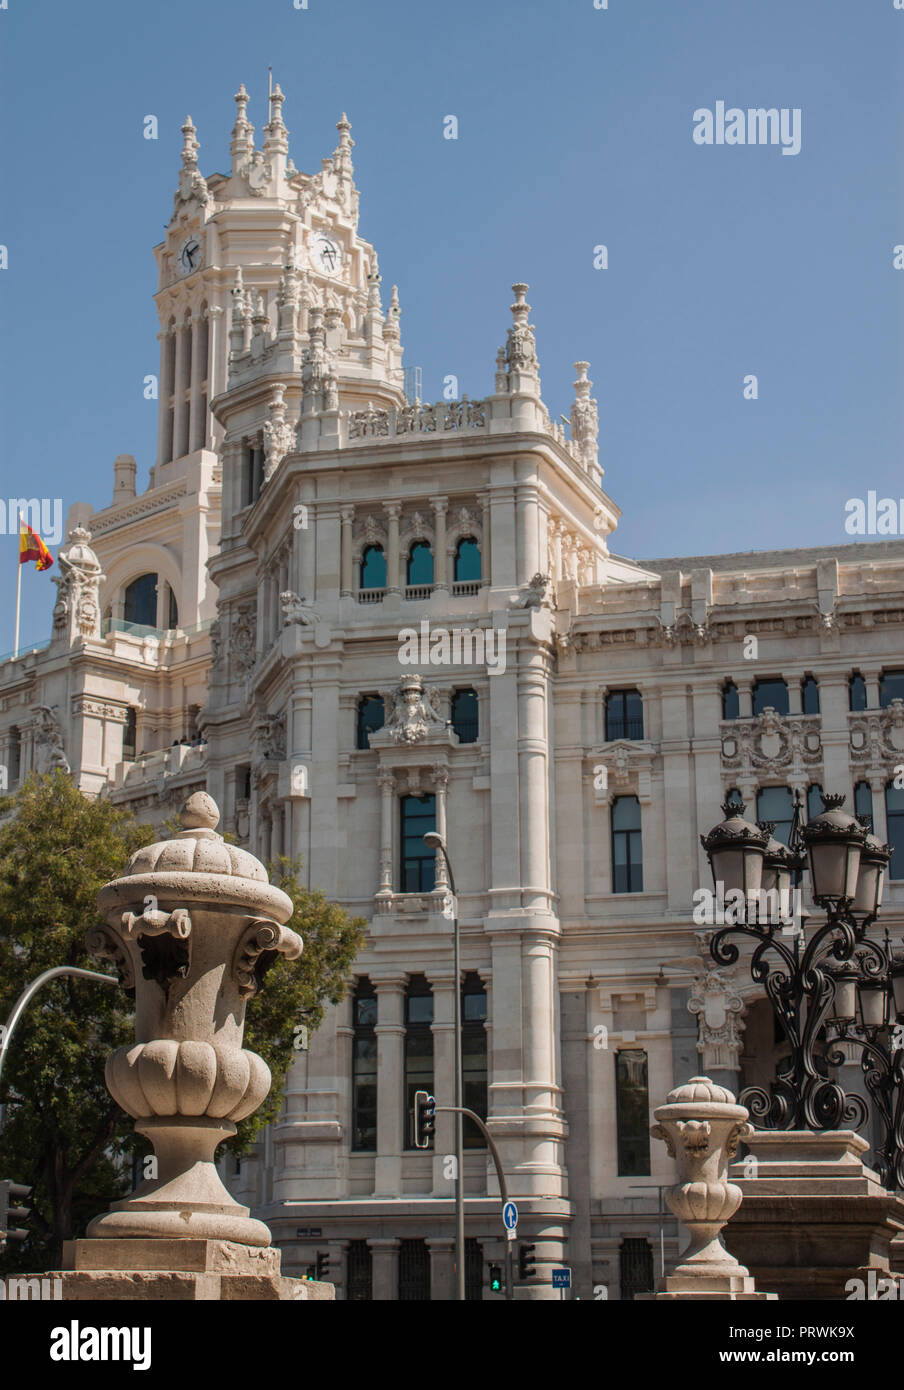 The Cybele Palace Palacio De Cibeles The City Hall Of